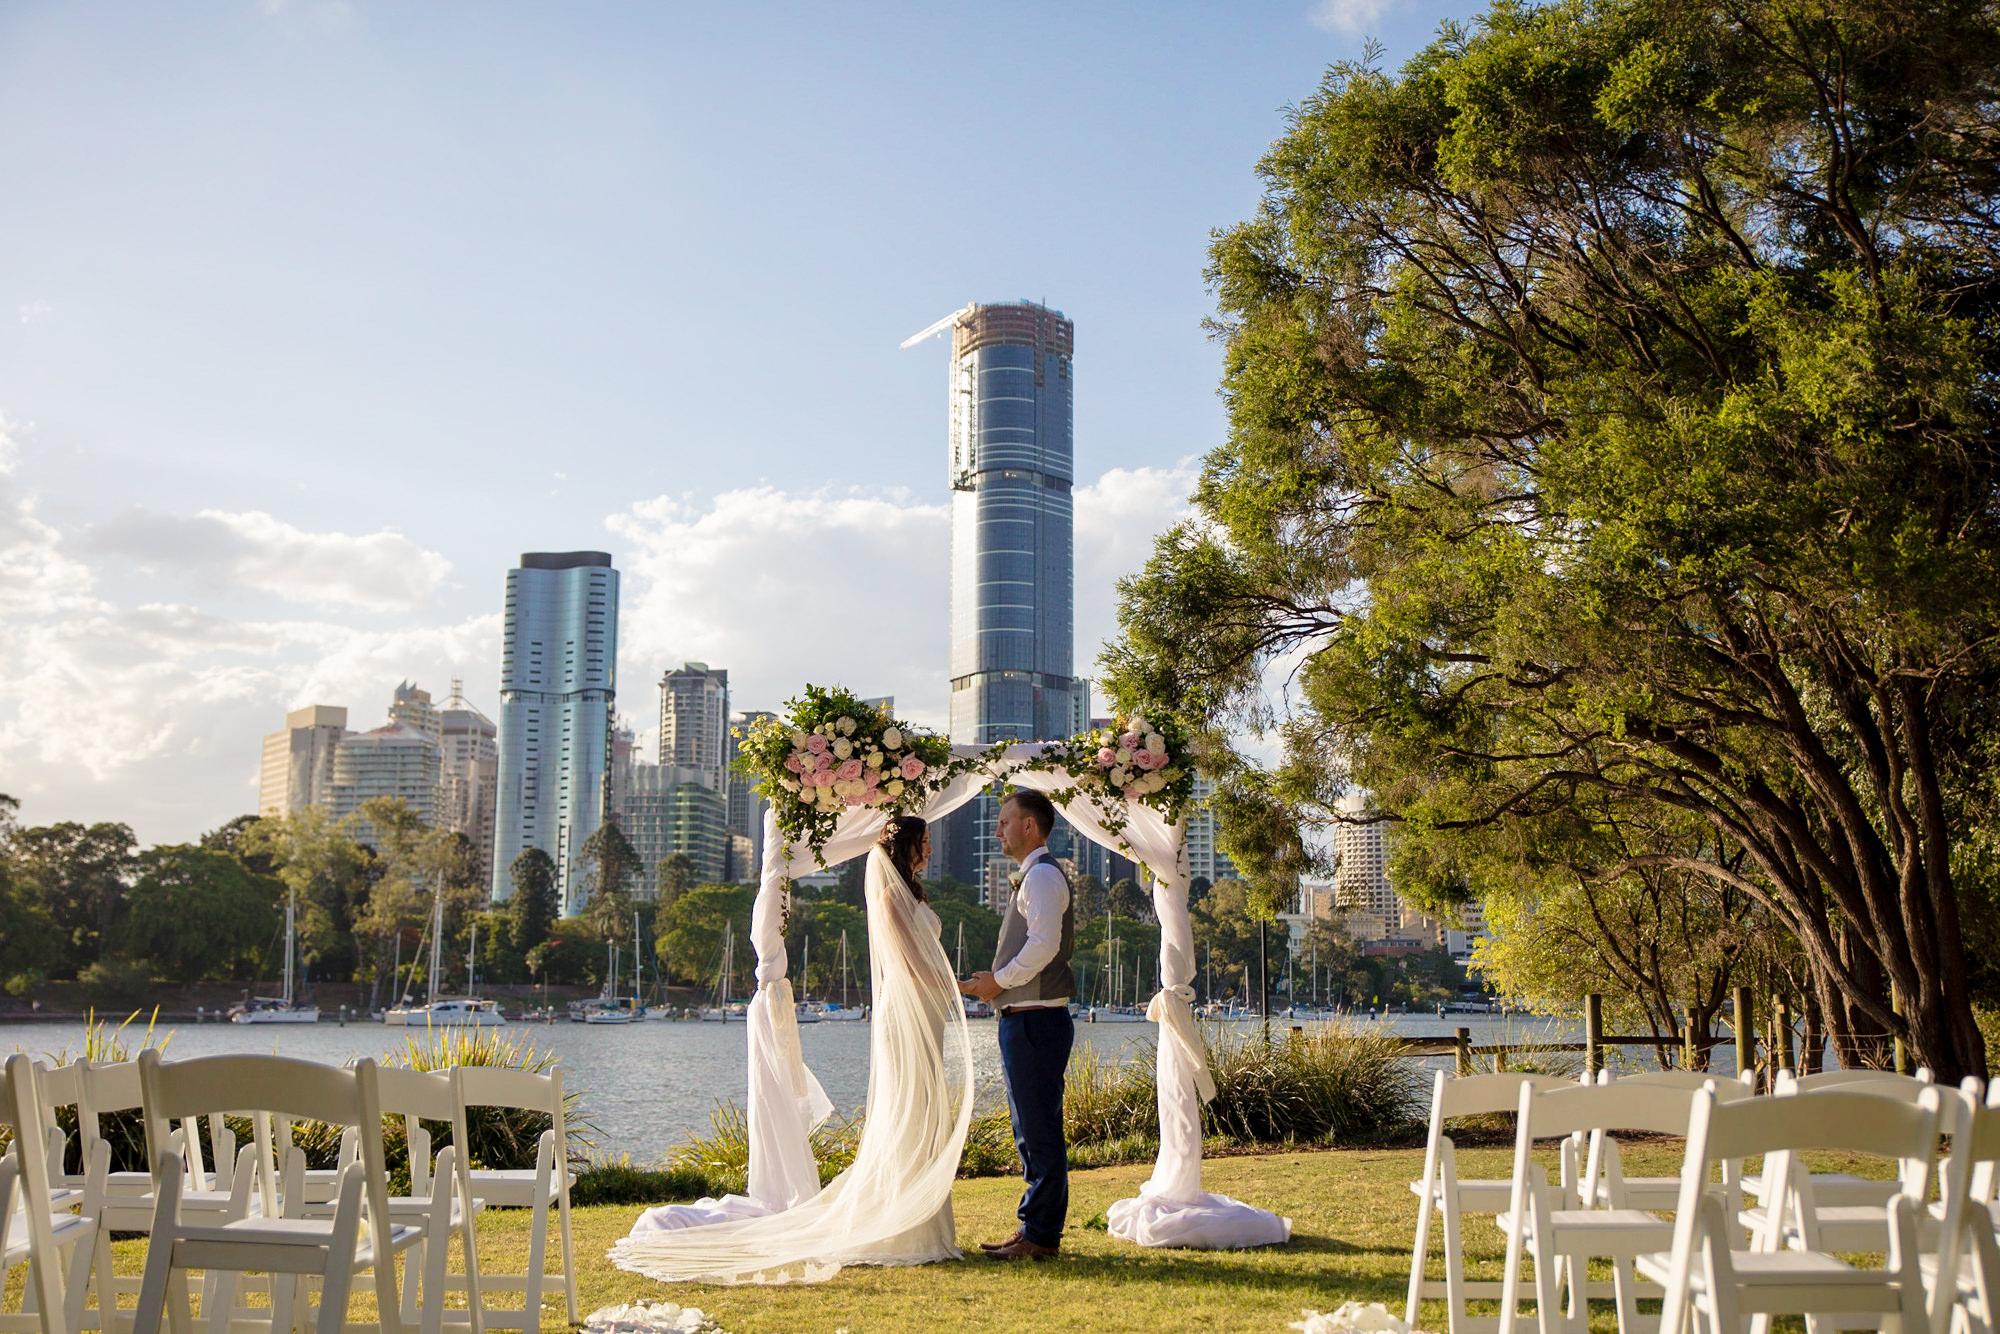 Riverlife wedding photographer